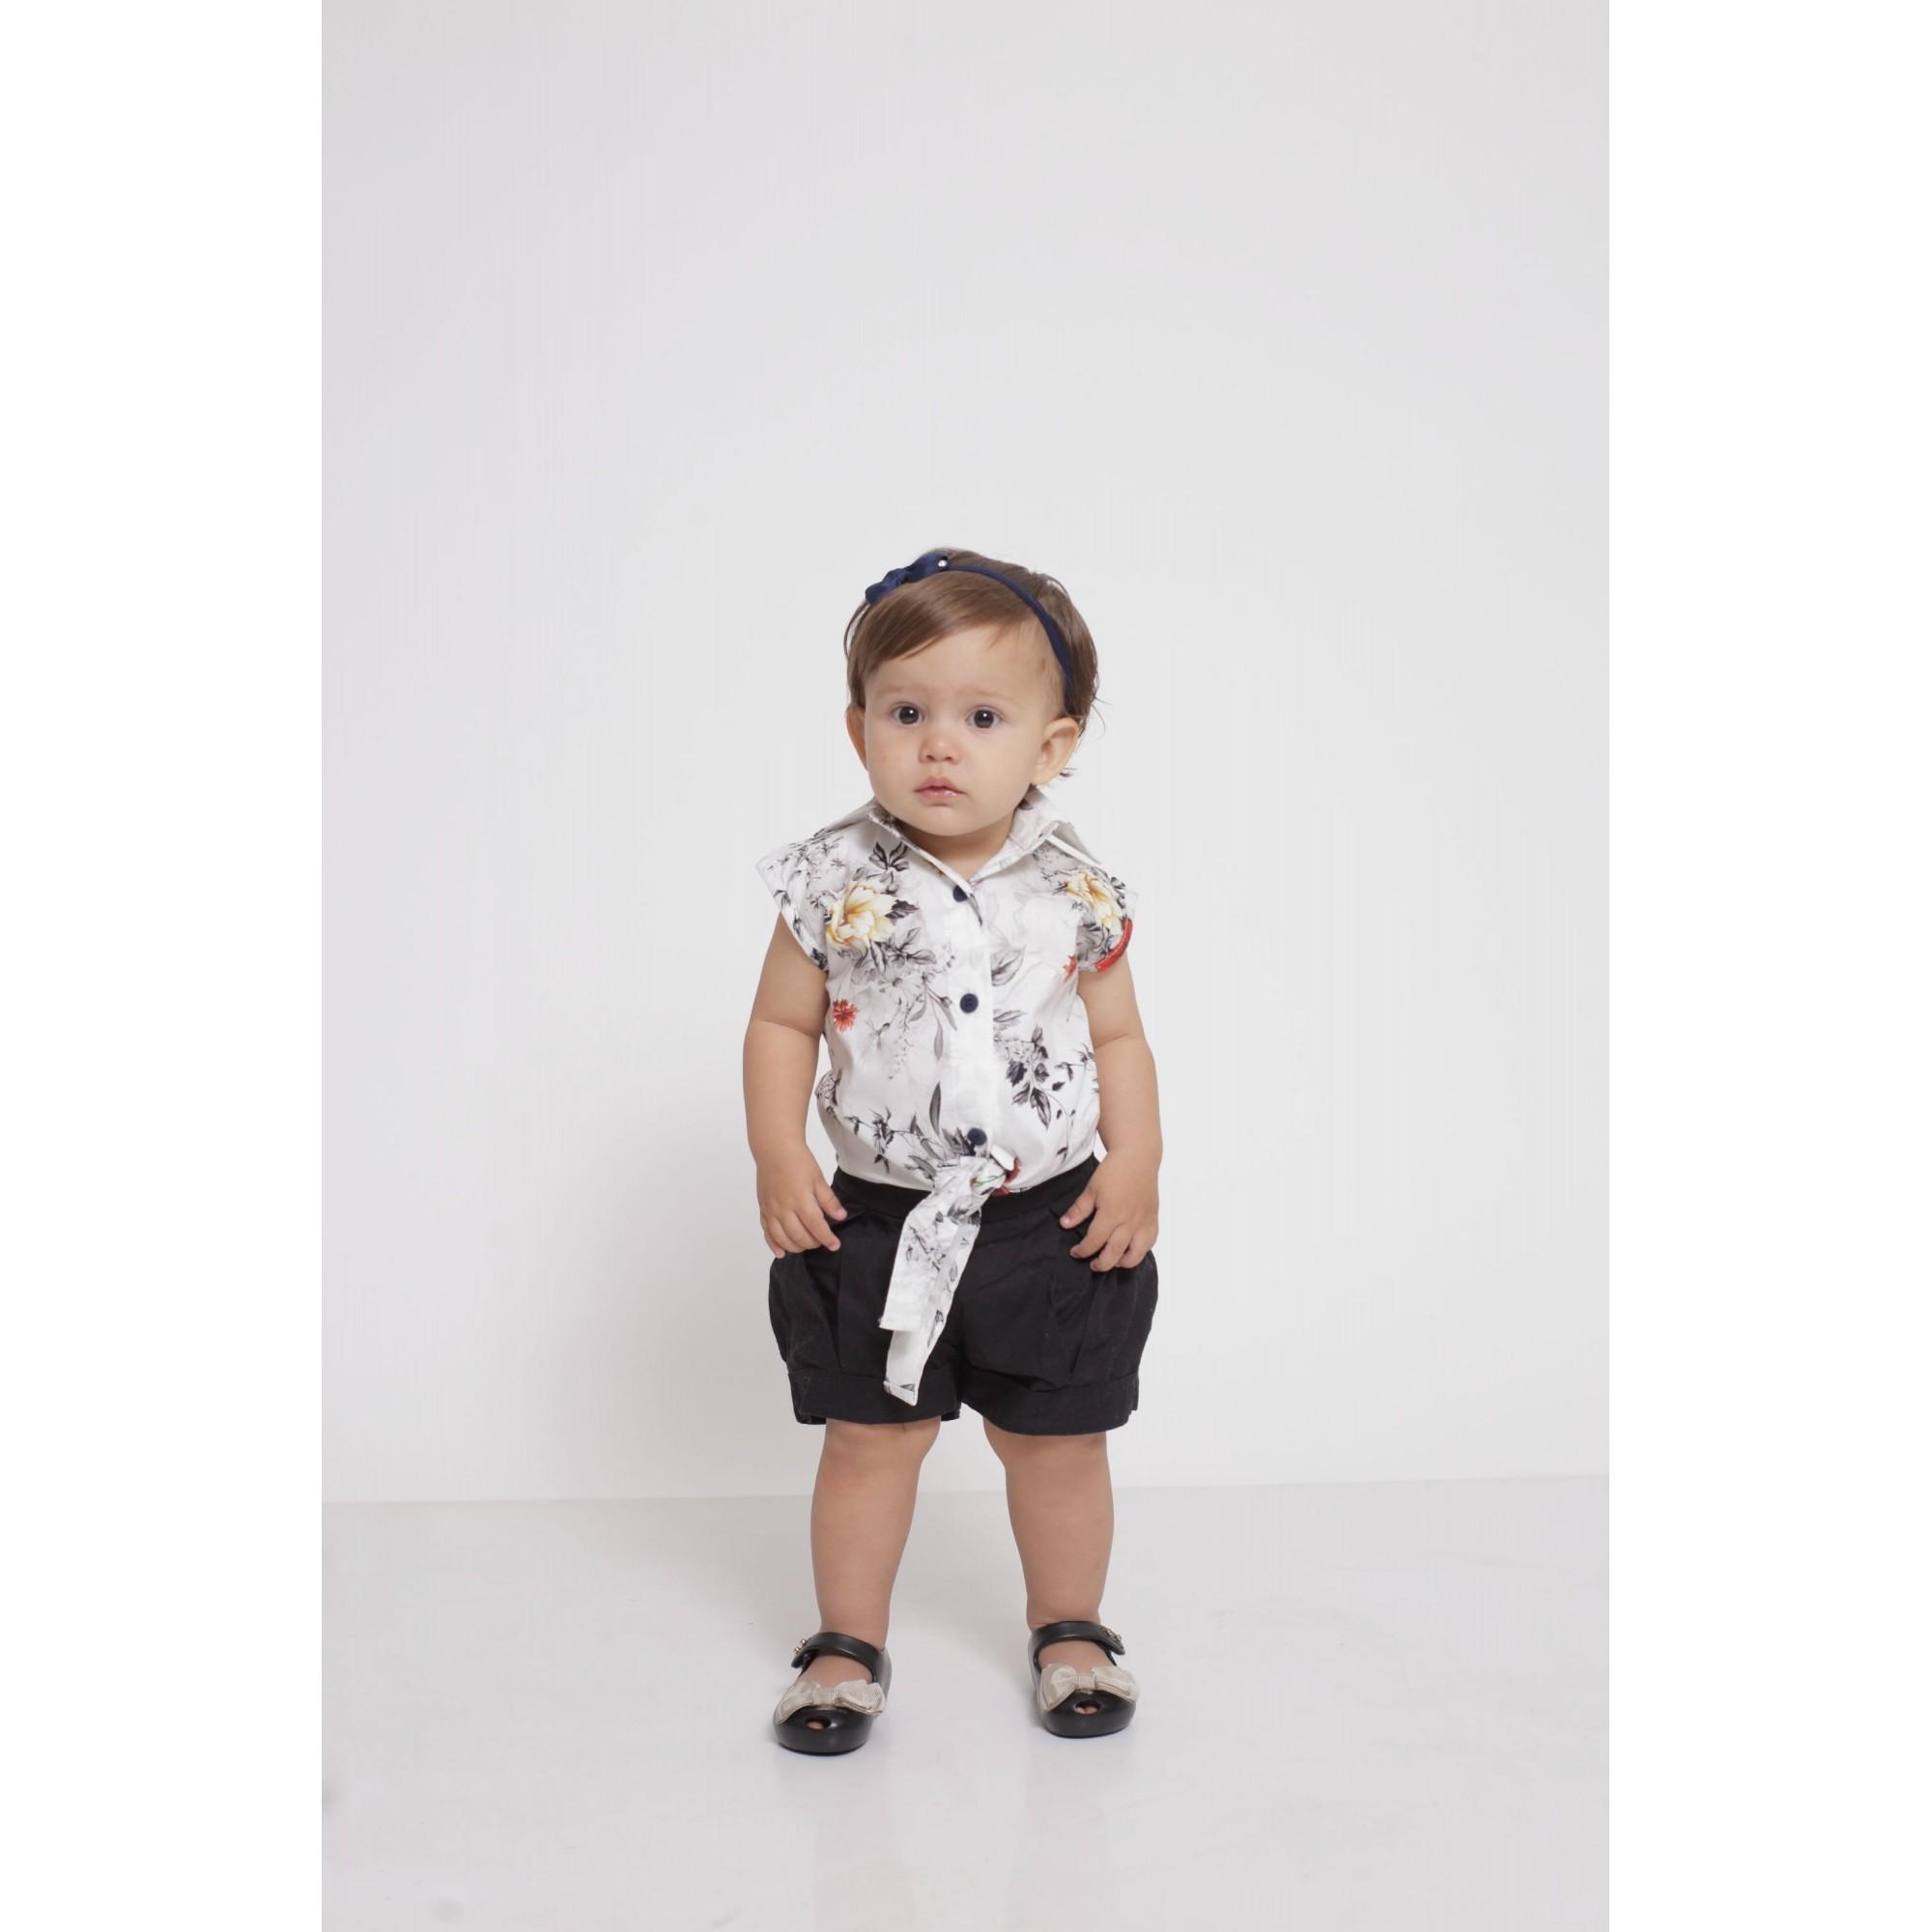 Camisa Social Sem Manga Branca Floral Feminina Infantil  - Heitor Fashion Brazil